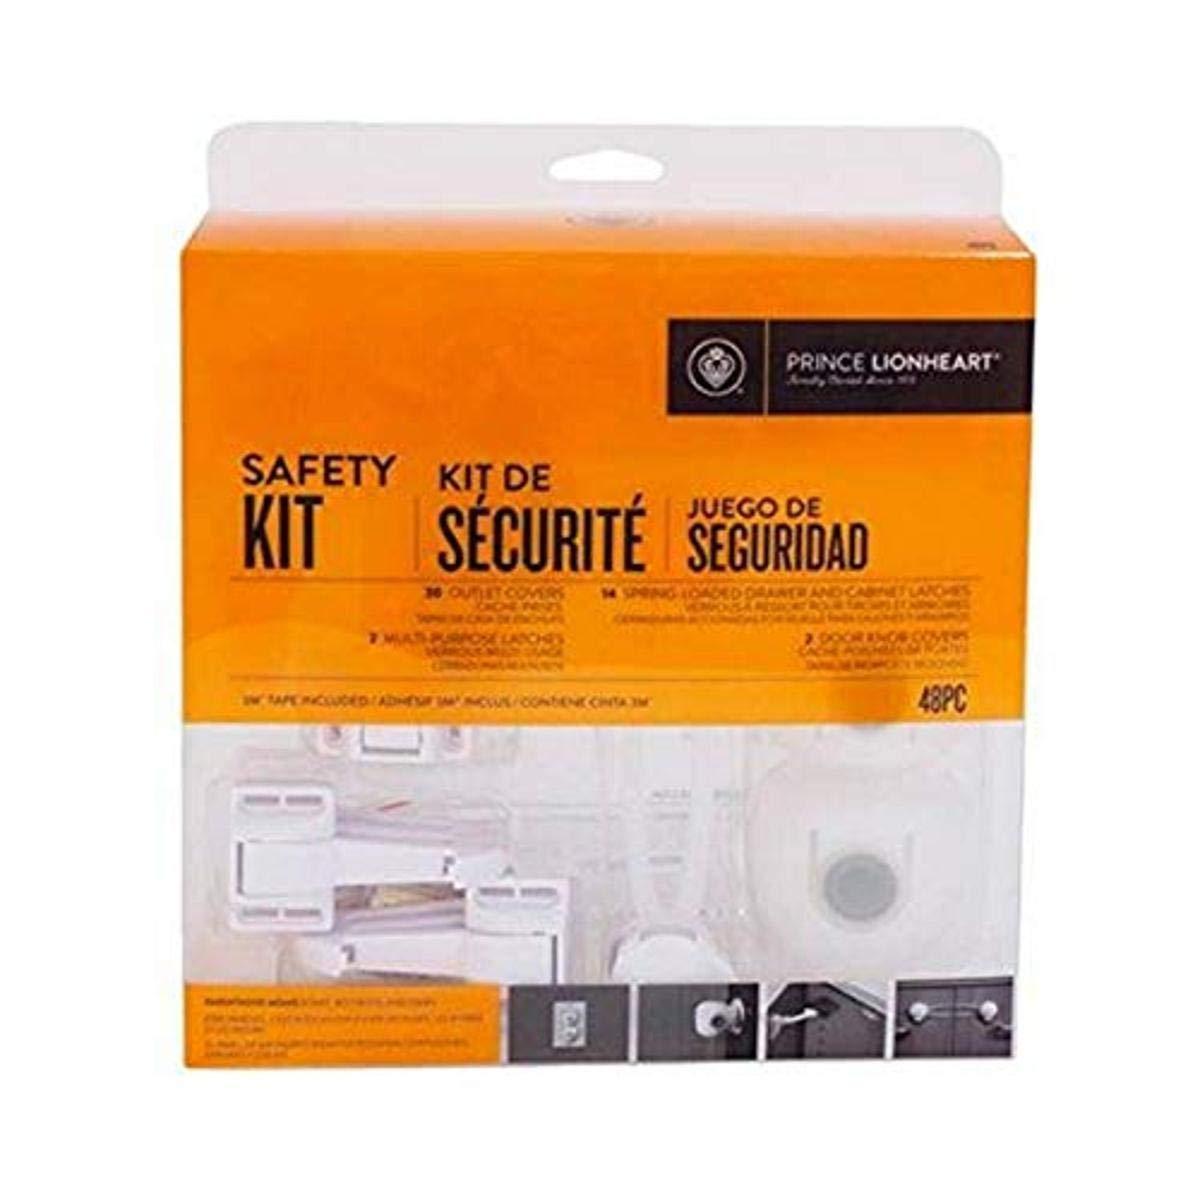 Prince Lionheart Prince Lionheart Safety Kit -48pcs